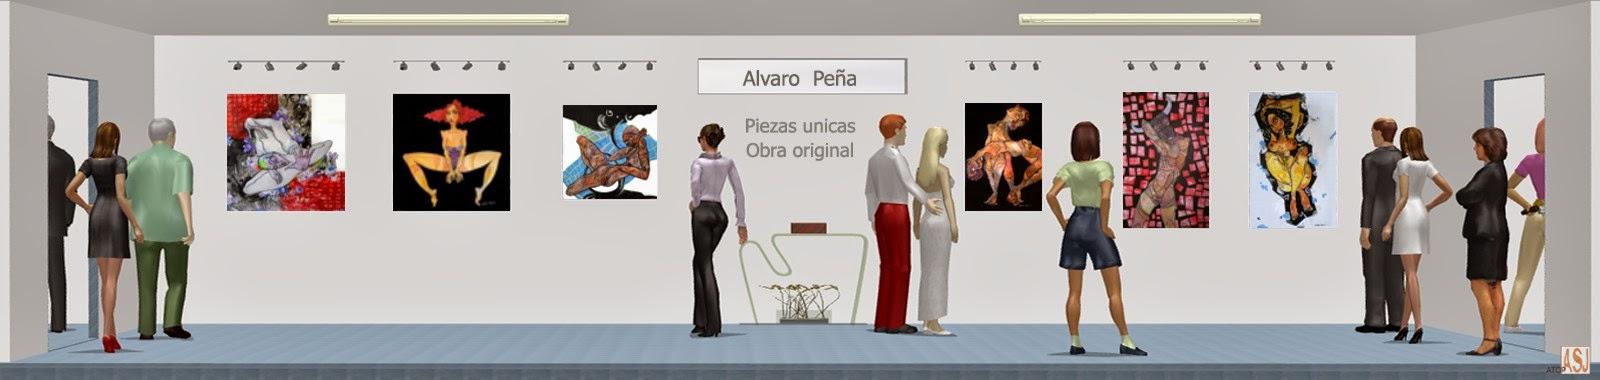 "<img src=""http://3.bp.blogspot.com/-UdSol1APmzo/UzhHOY-kayI/AAAAAAAAWcg/V0d1jDYPCPM/s1600/sala_de_exposicion_de_alvaro_pe%C3%B1a.jpg"" alt=""sala de exposición virtual de pinturas de Álvaro Peña ""/>"